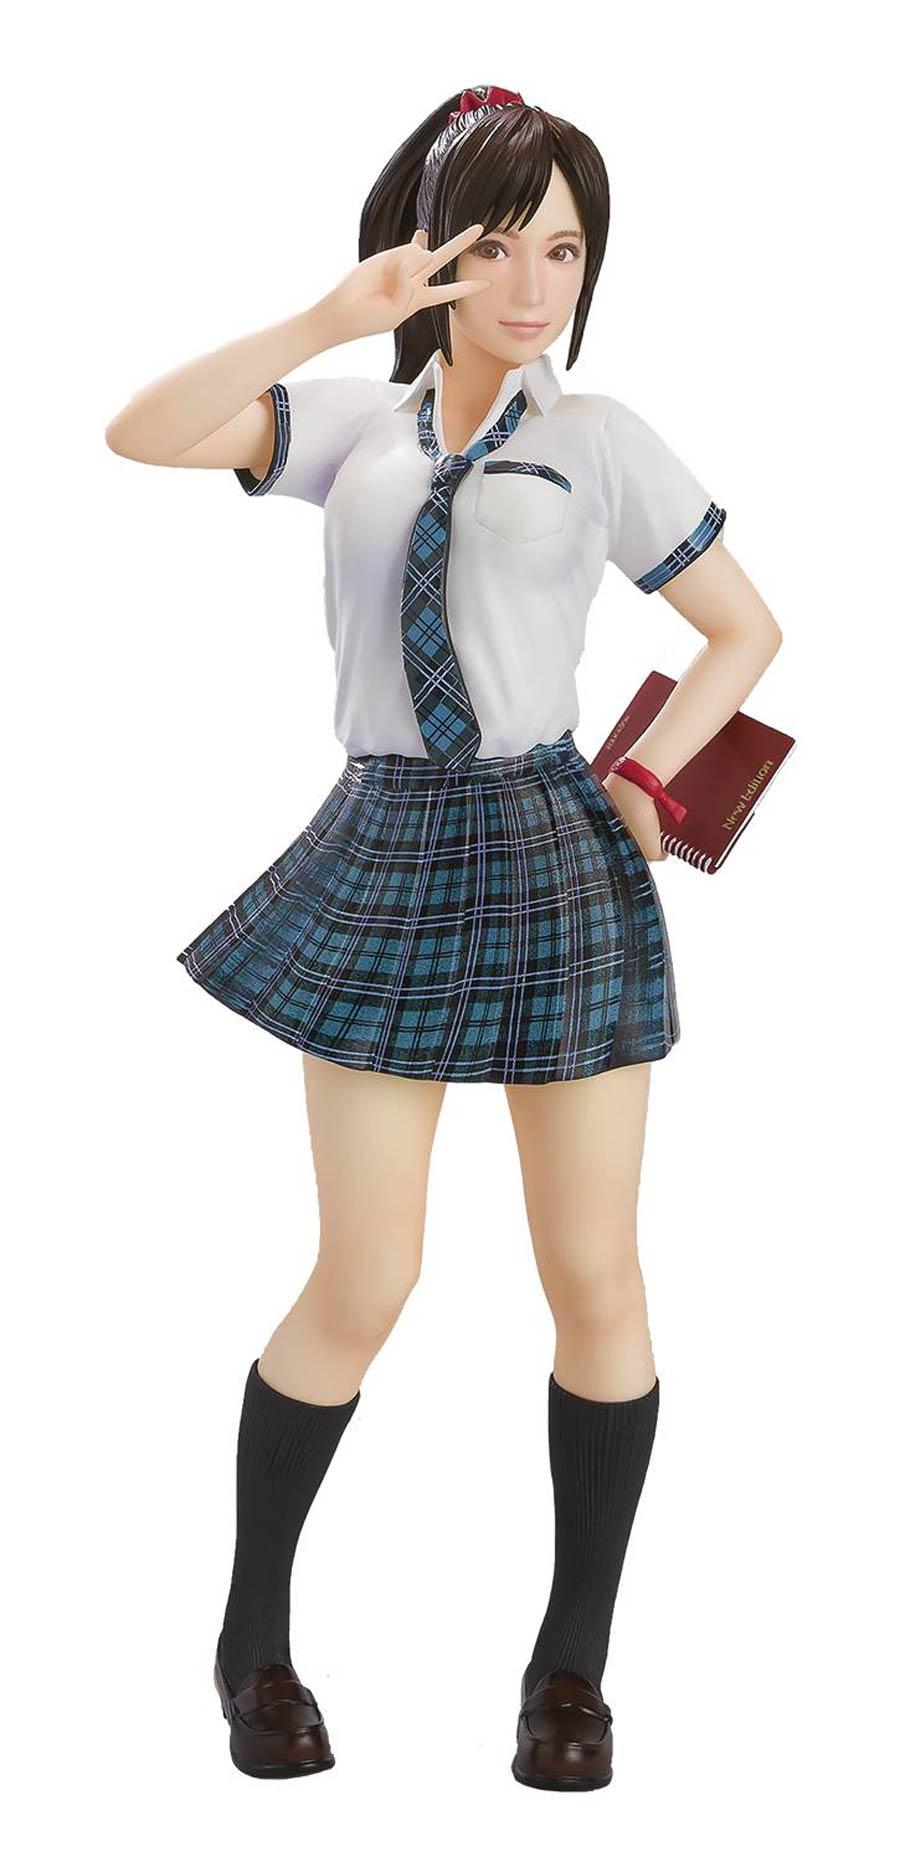 Summer Lesson Figuarts ZERO - Hikari Miyamoto Figure